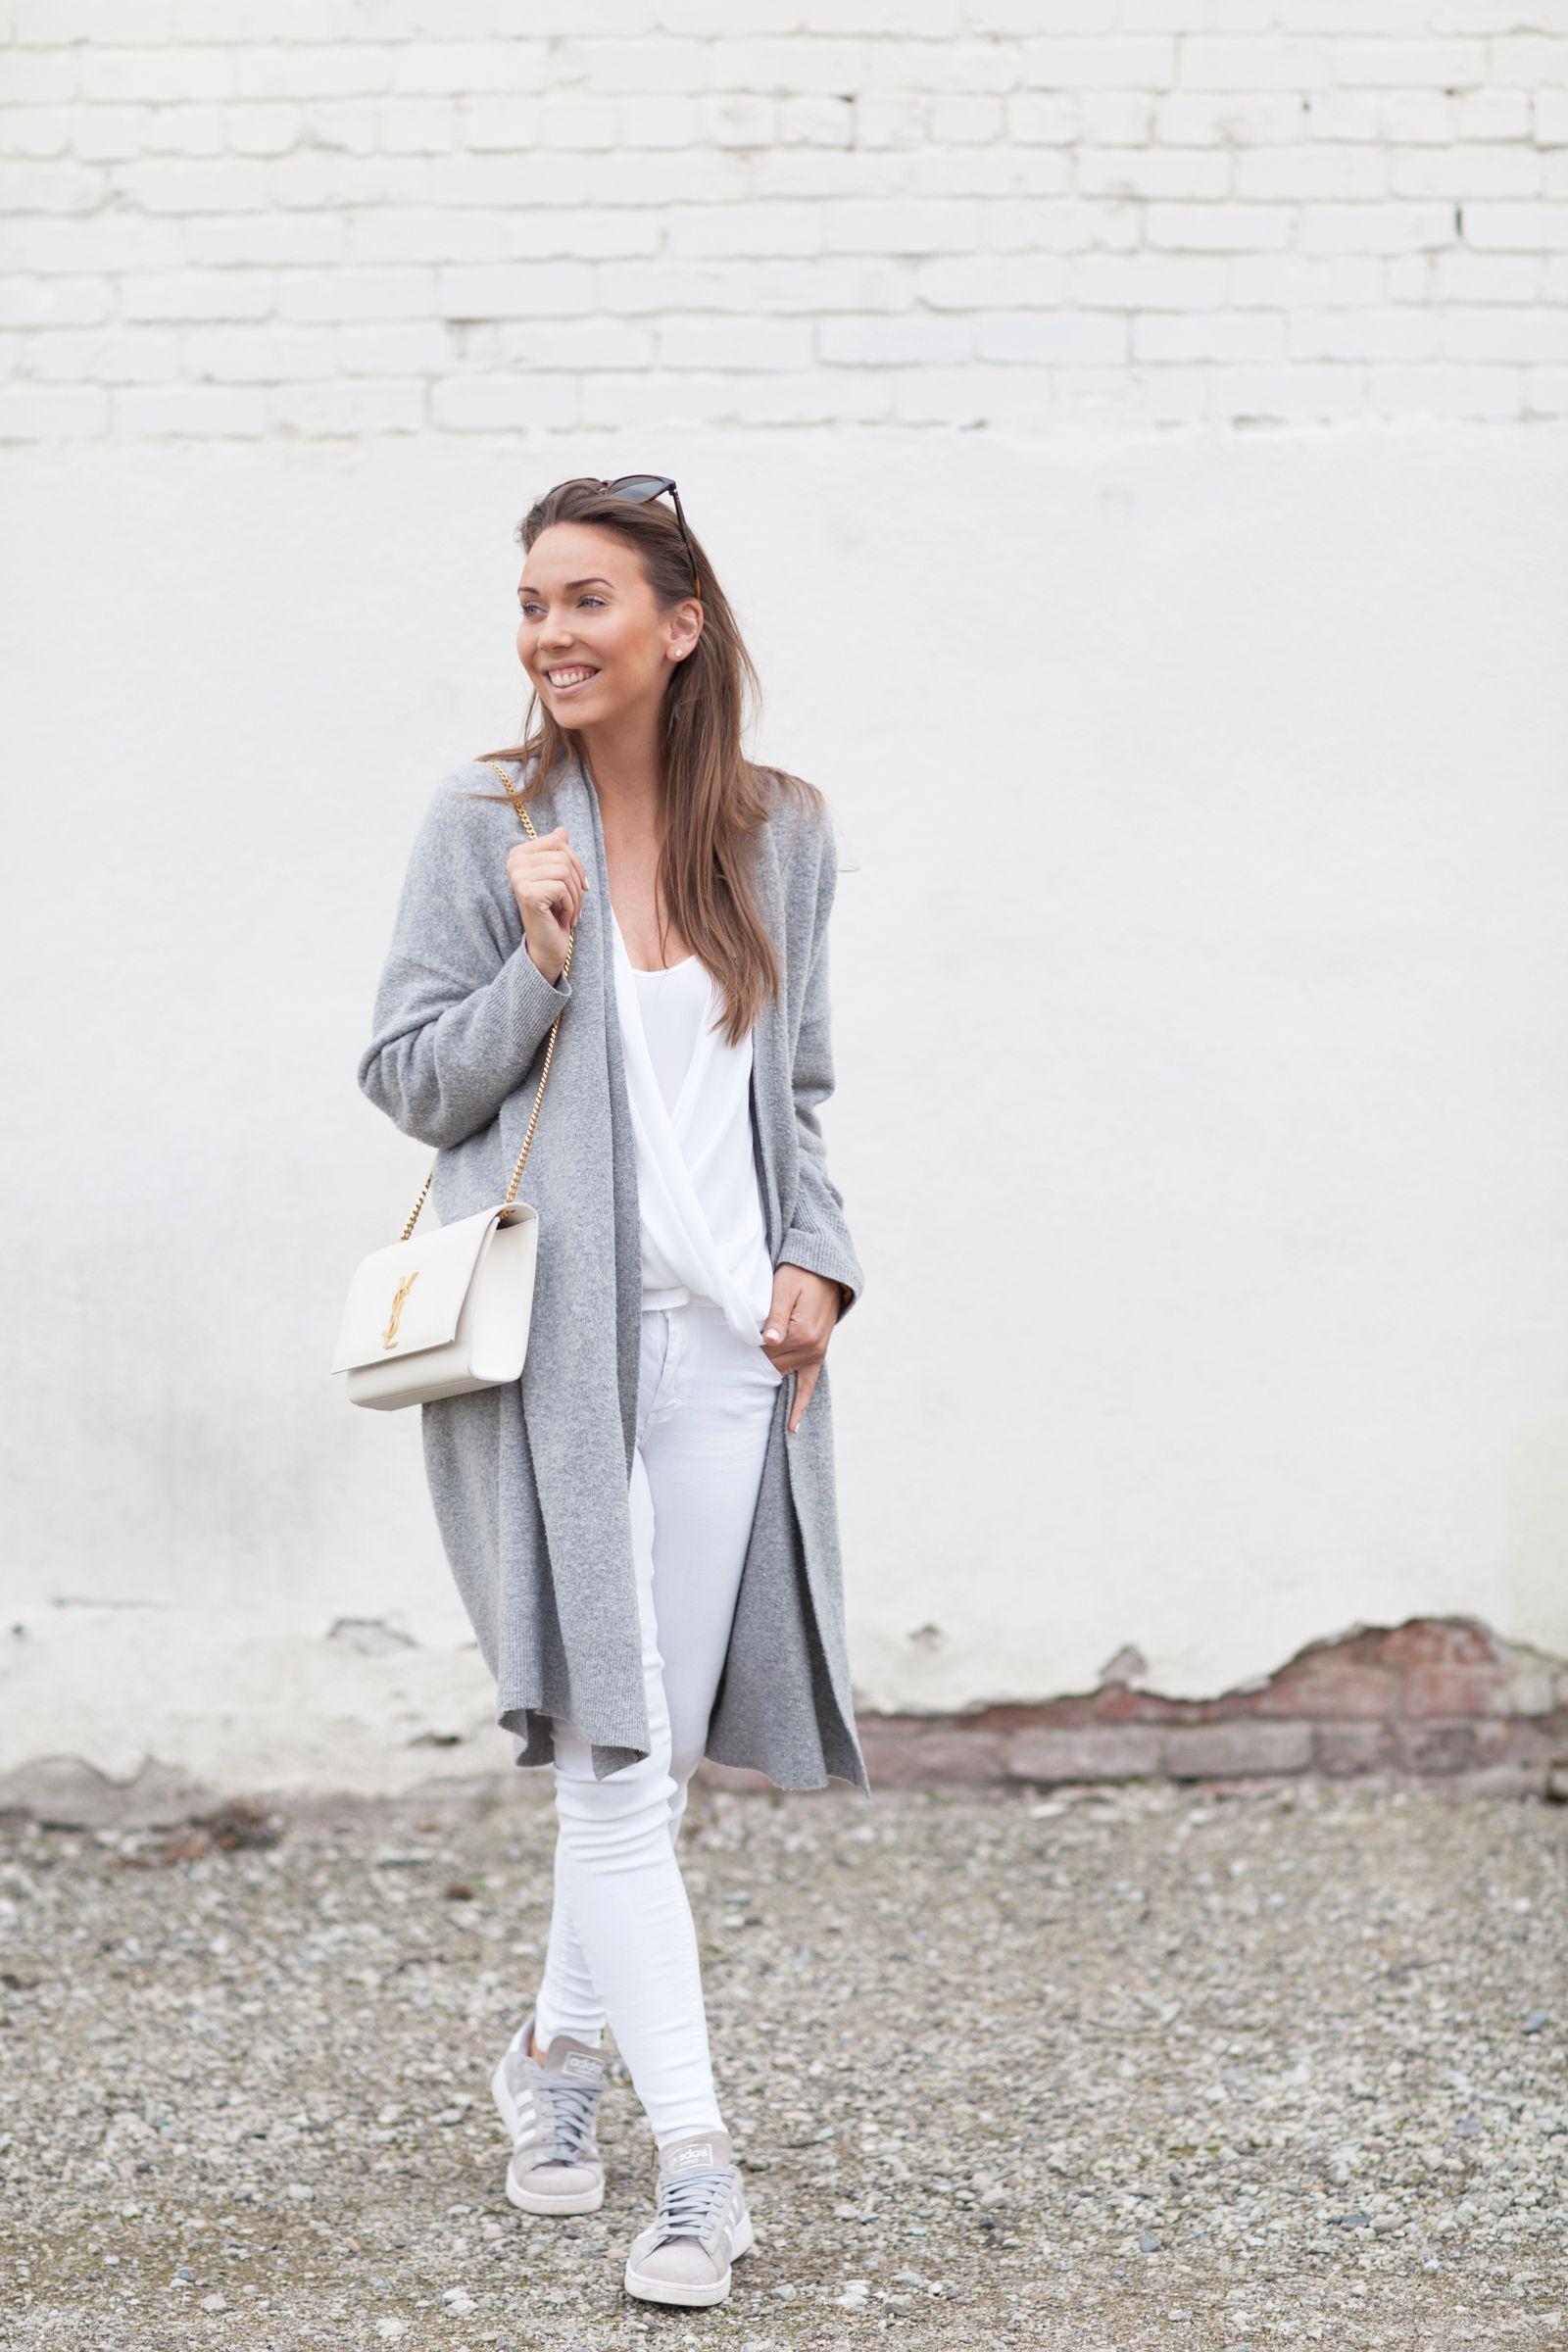 knit DKNY blouse BCBGMAXAZRIA pants SUPERTRASH sneakers ADIDAS campus bag YSL sunnies CÉLINE | Hanna Väyrynen